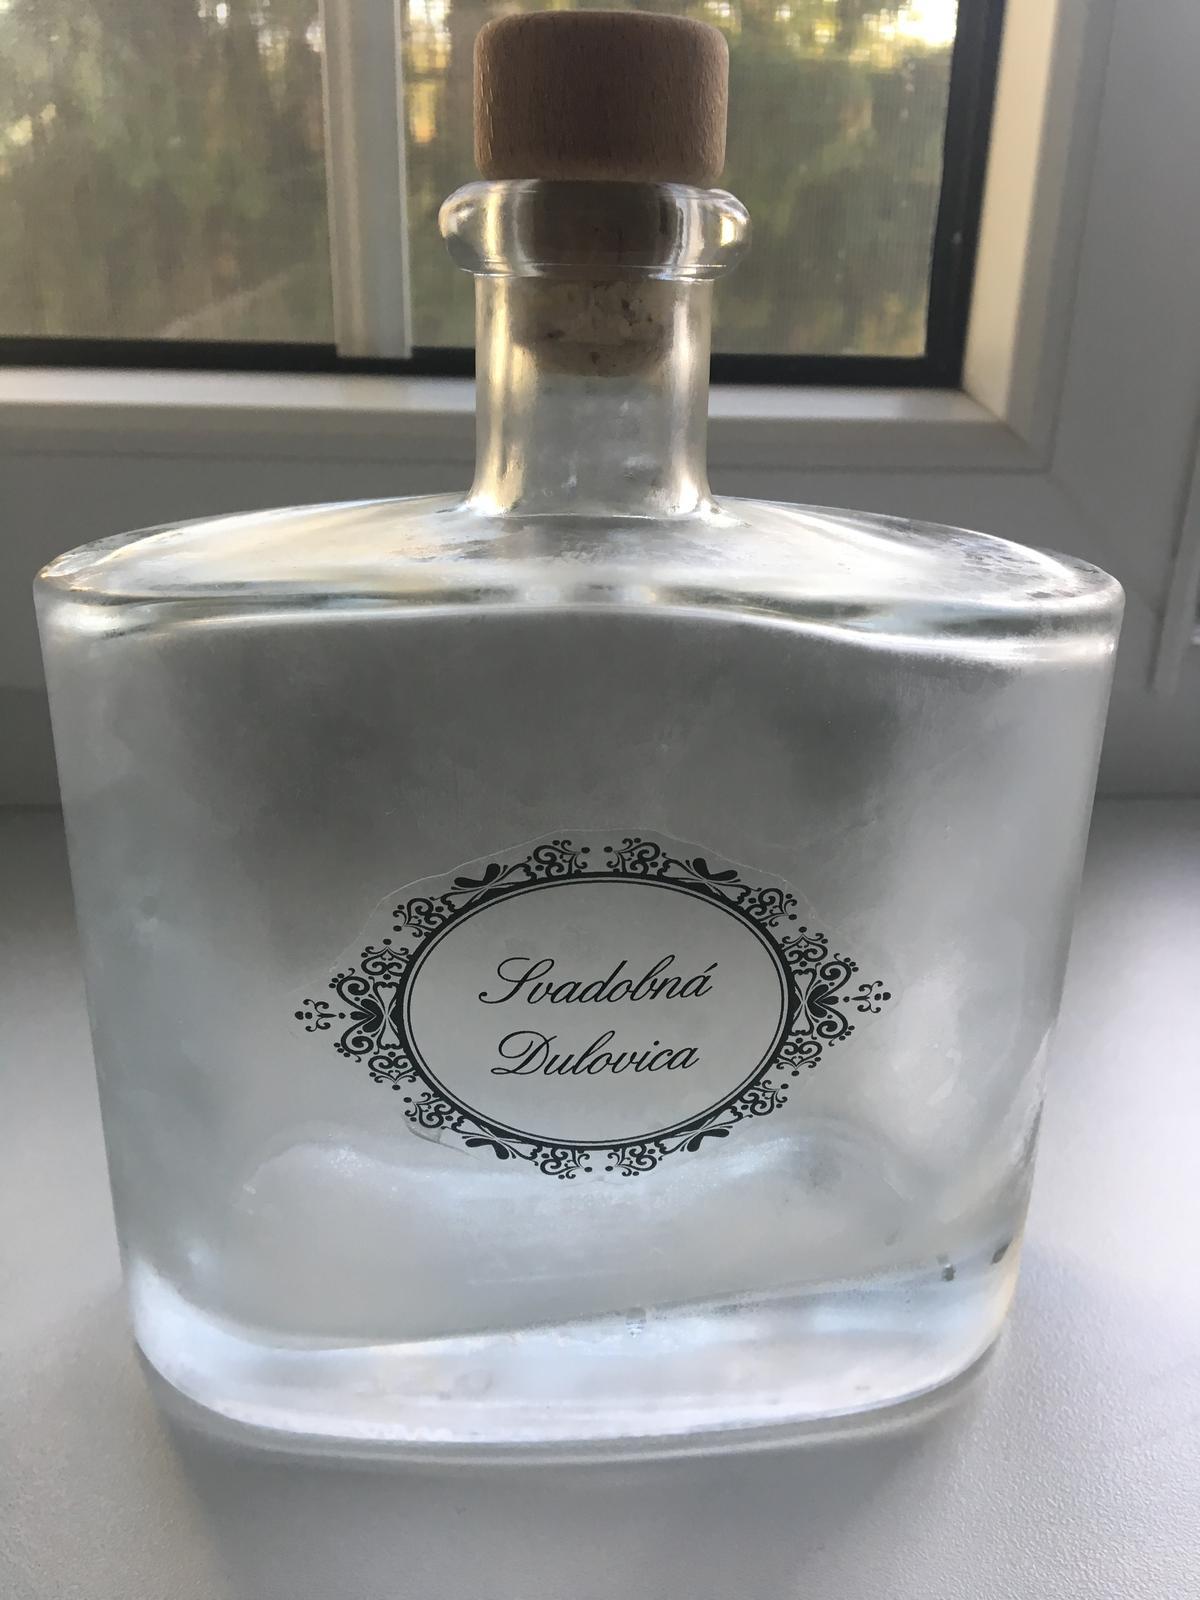 Samolepky na fľašky - Obrázok č. 1